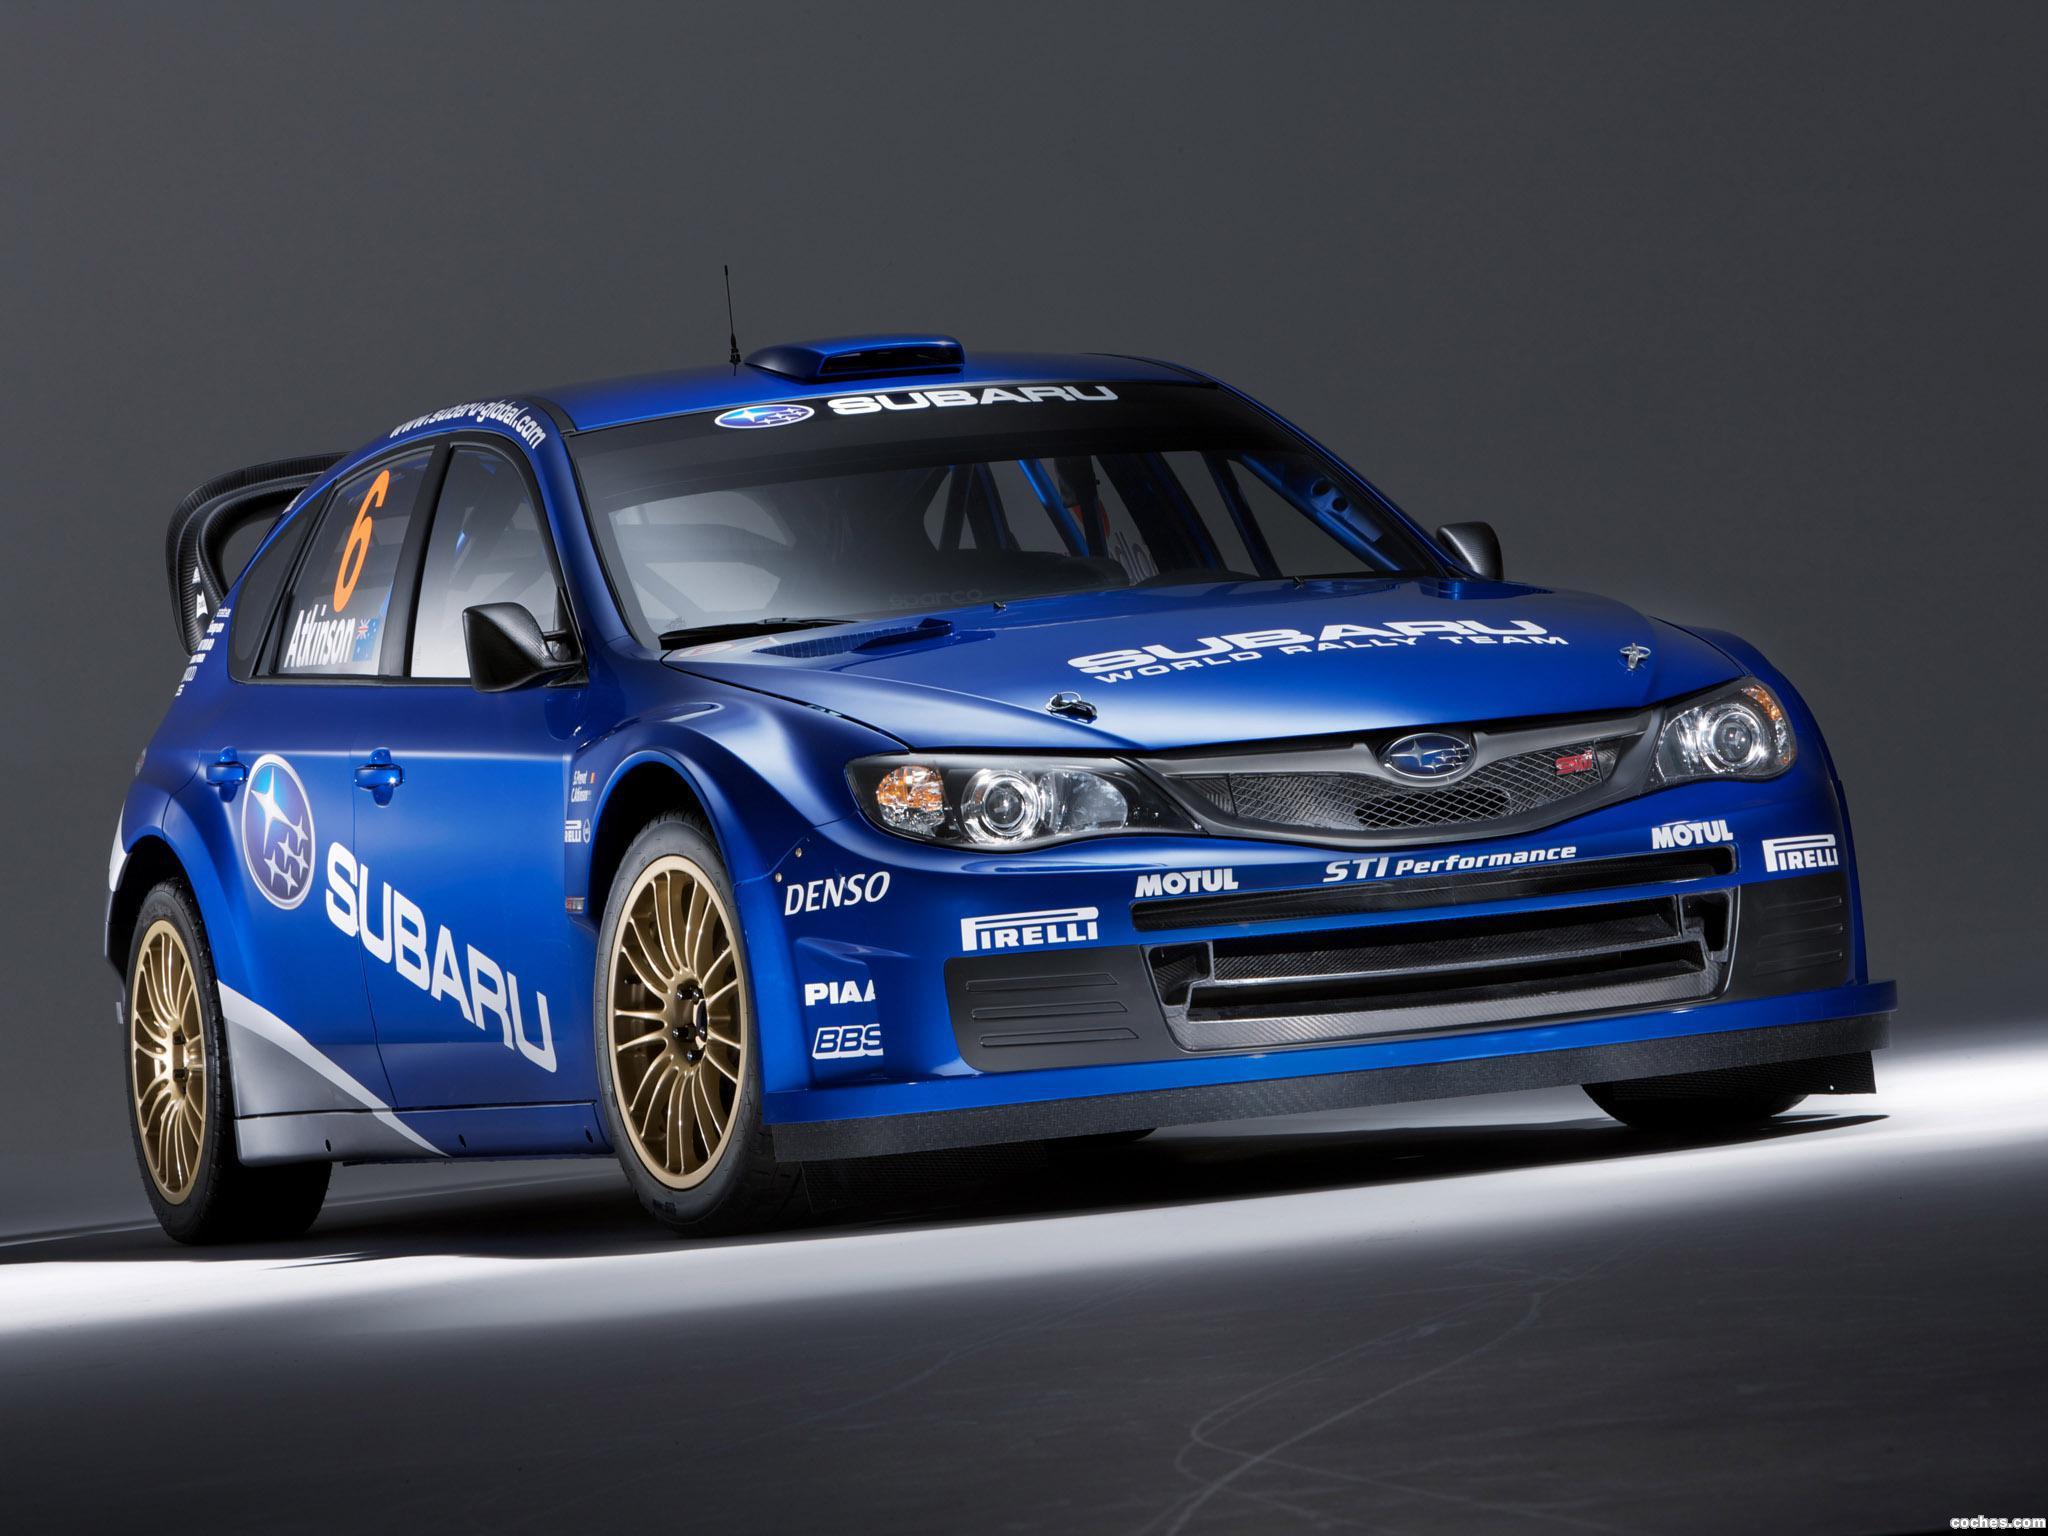 Foto 2 de Subaru Impreza WRC 2008